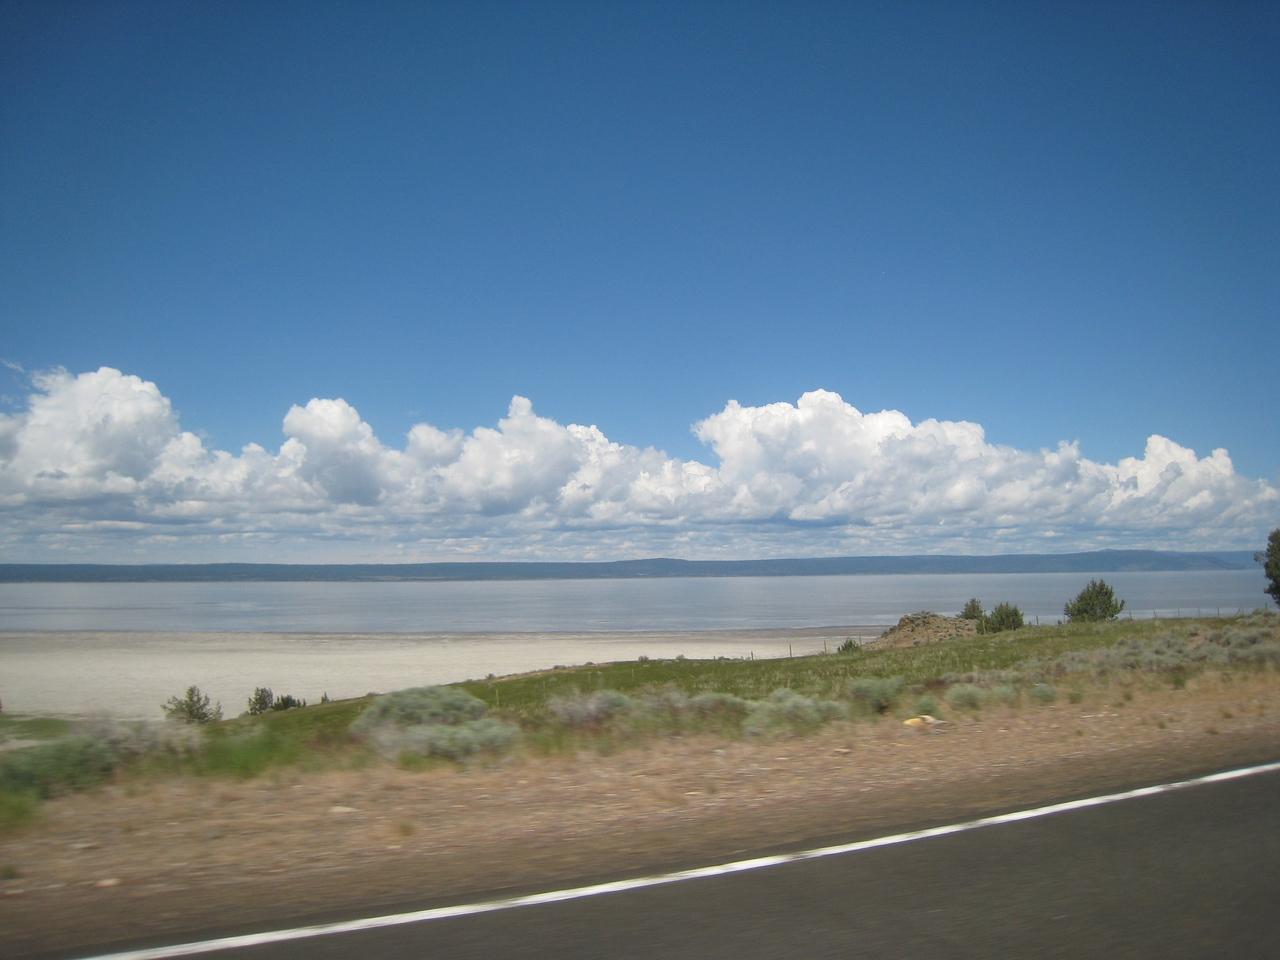 Goose Lake marks the entrance into Oregon.